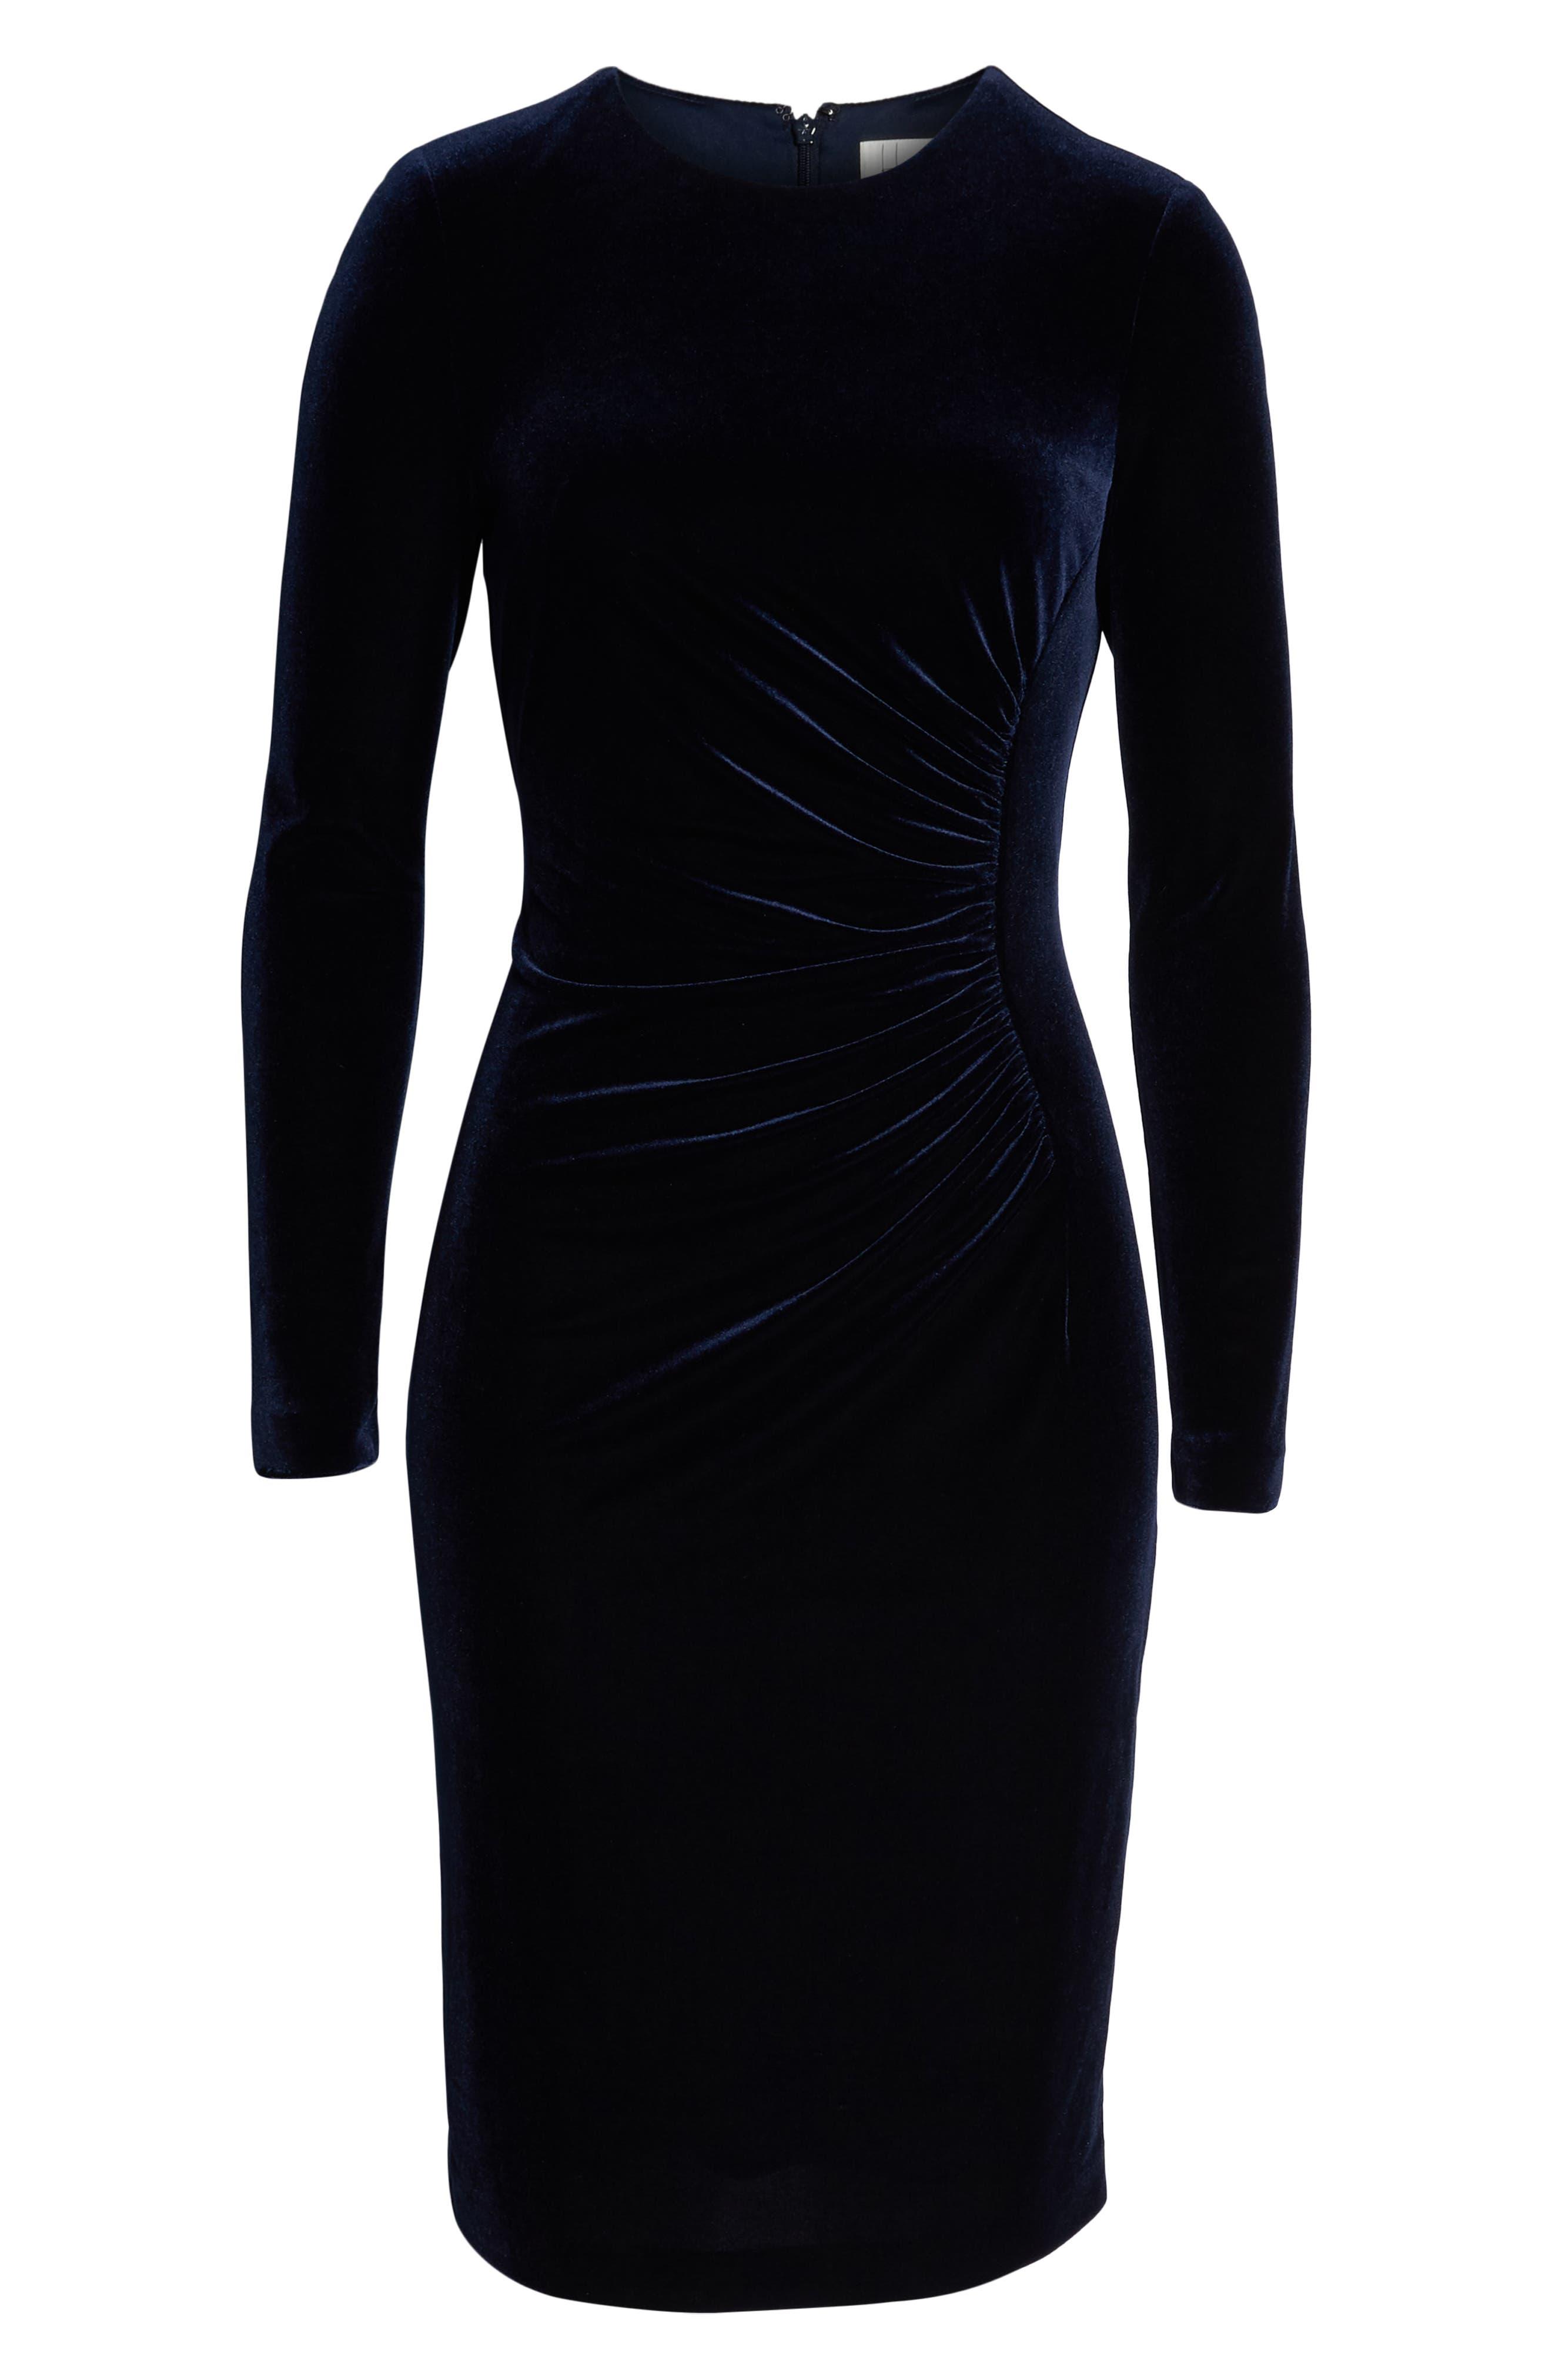 HARPER ROSE, Long Sleeve Body-Con Dress, Alternate thumbnail 7, color, 410